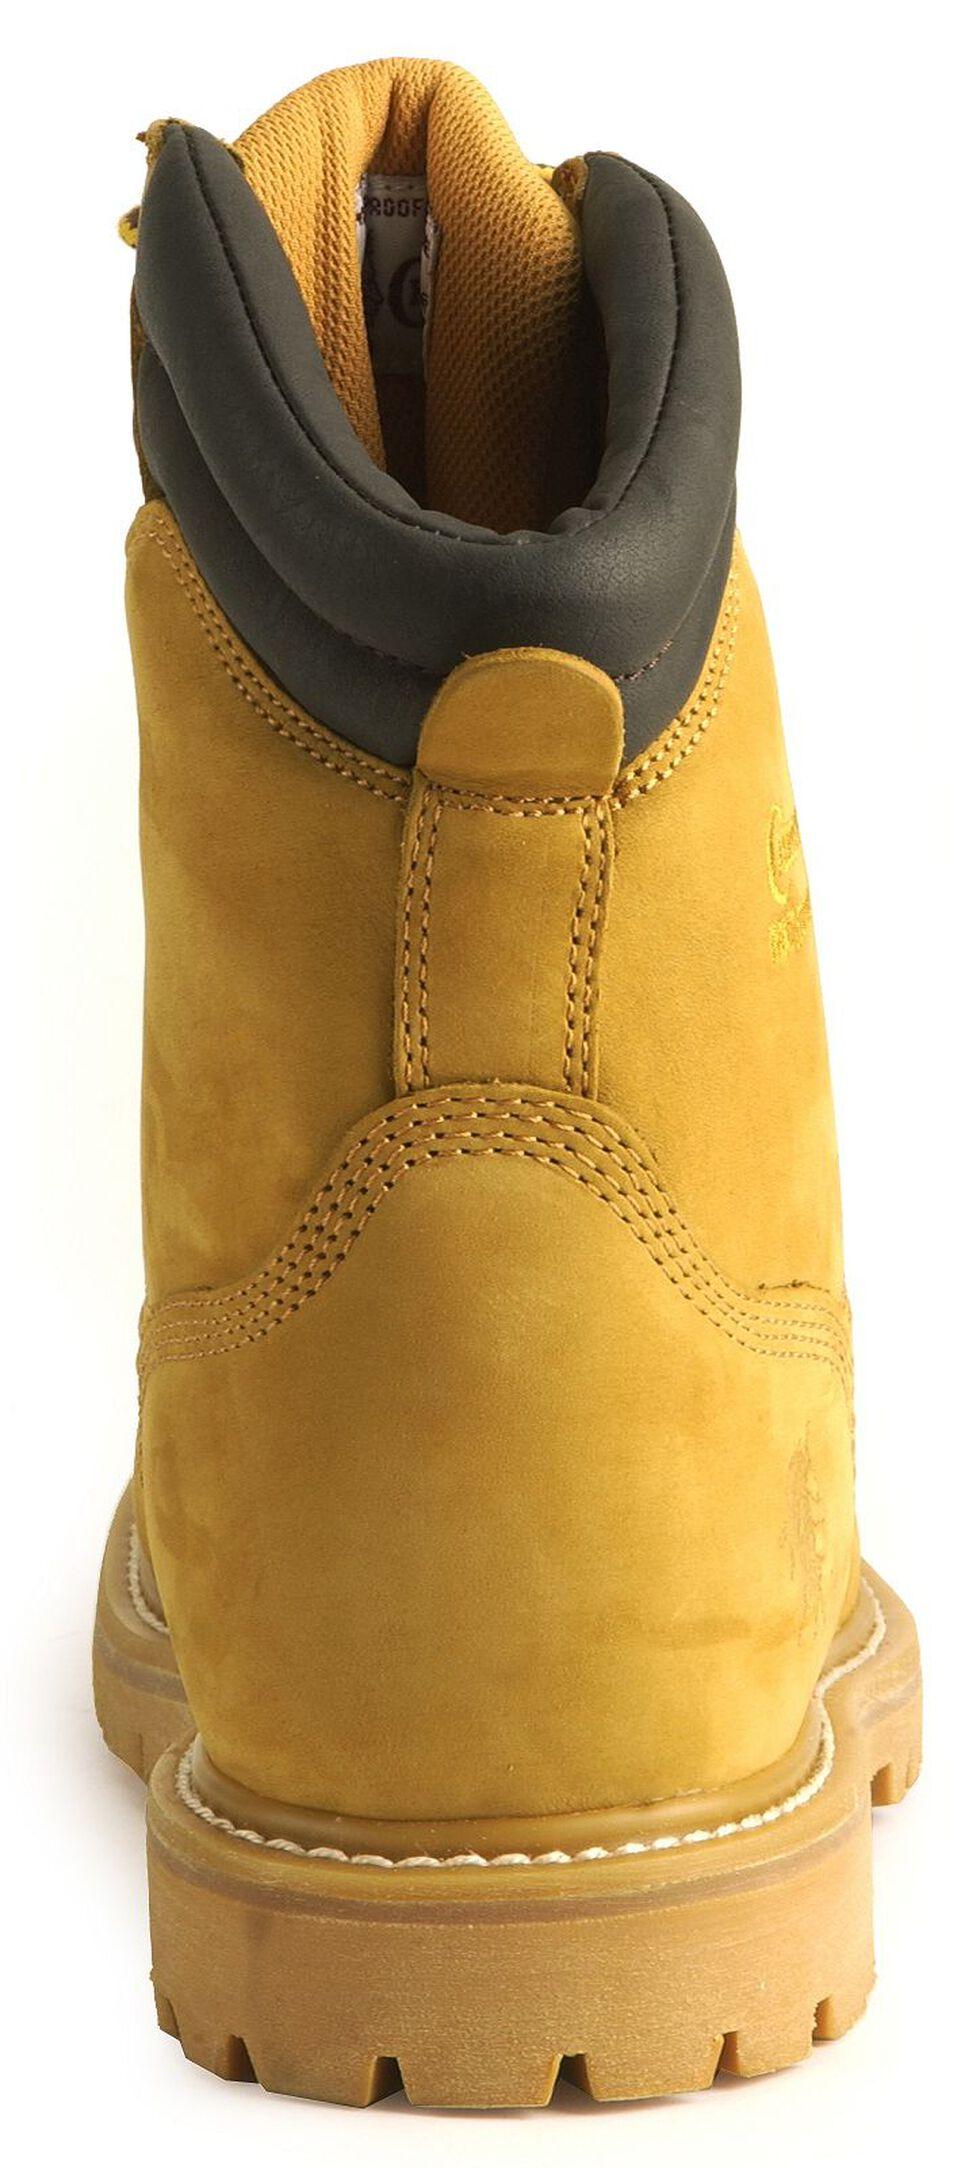 "Chippewa IQ Waterproof 8"" Lace-Up Work Boots - Steel Toe, Nubuck, hi-res"